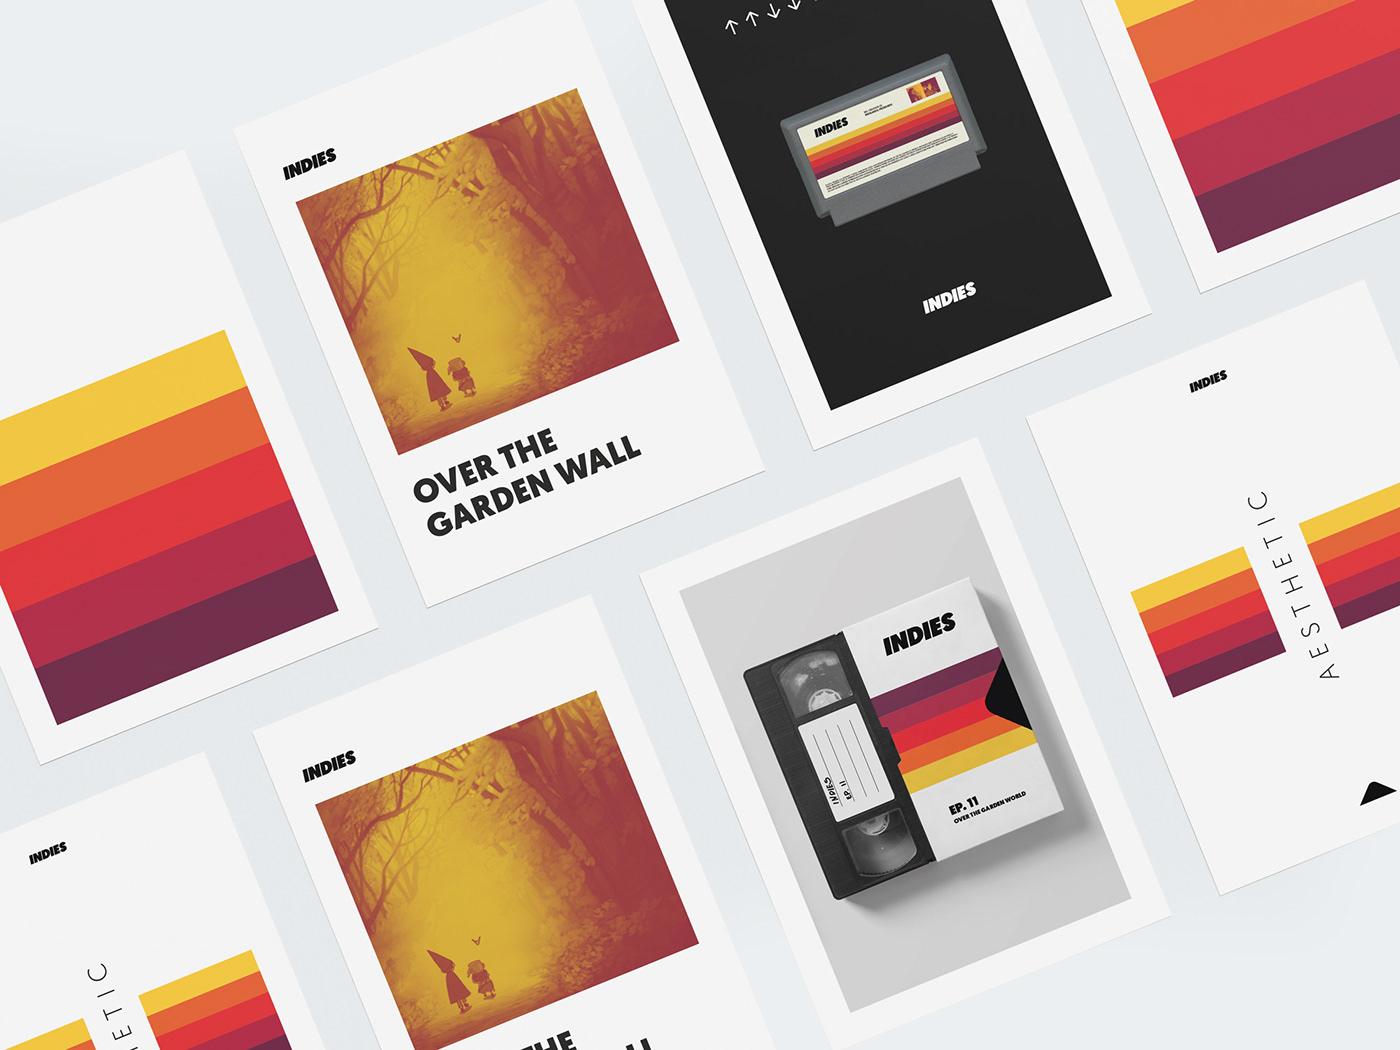 art direction  Brand Design branding  Corporate Identity Cover Art Podcast cover Podcast Cover Art Podcast Design visual design visual identity